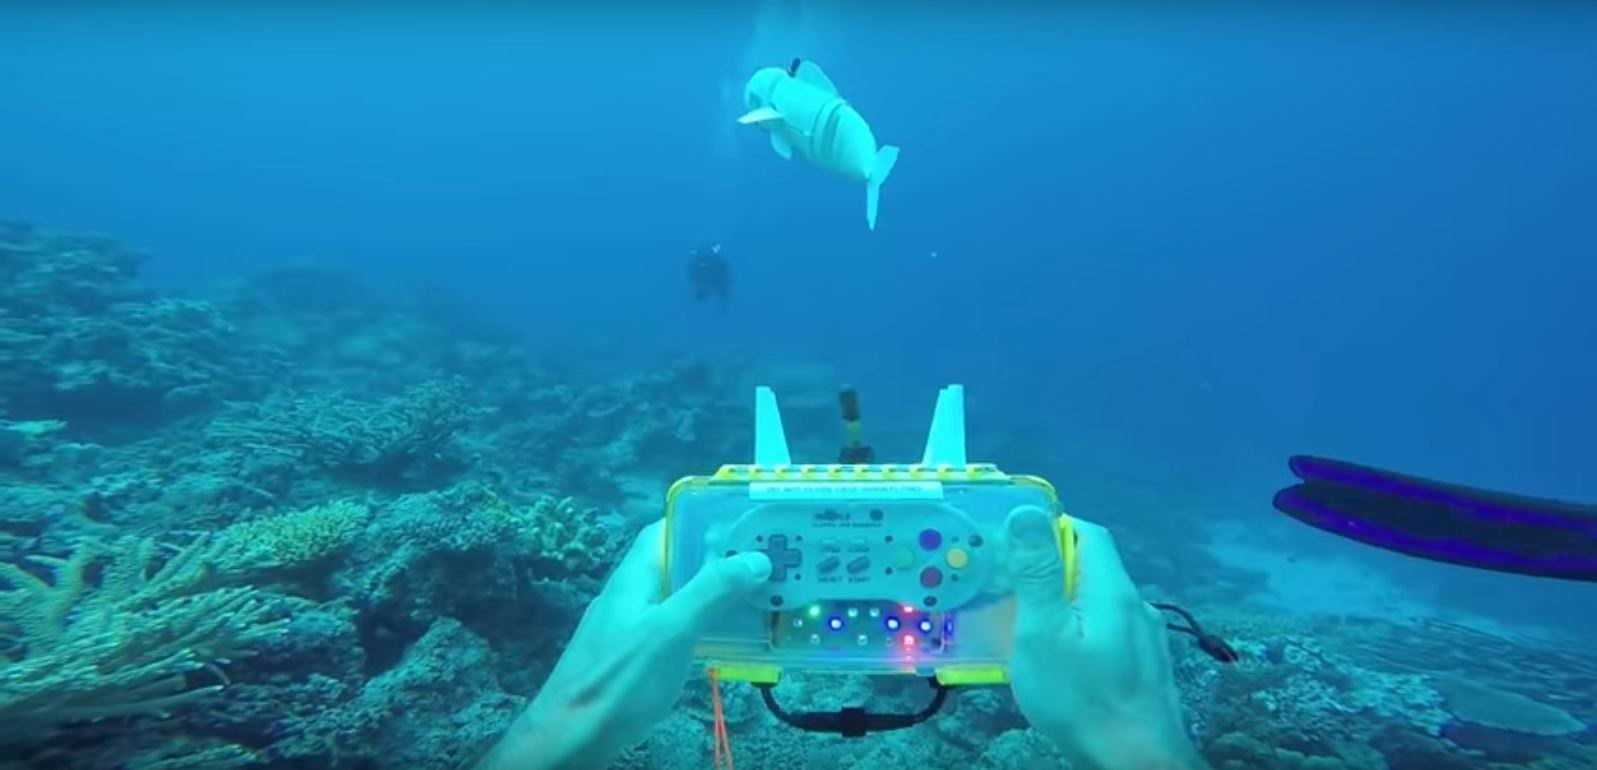 fish-controller